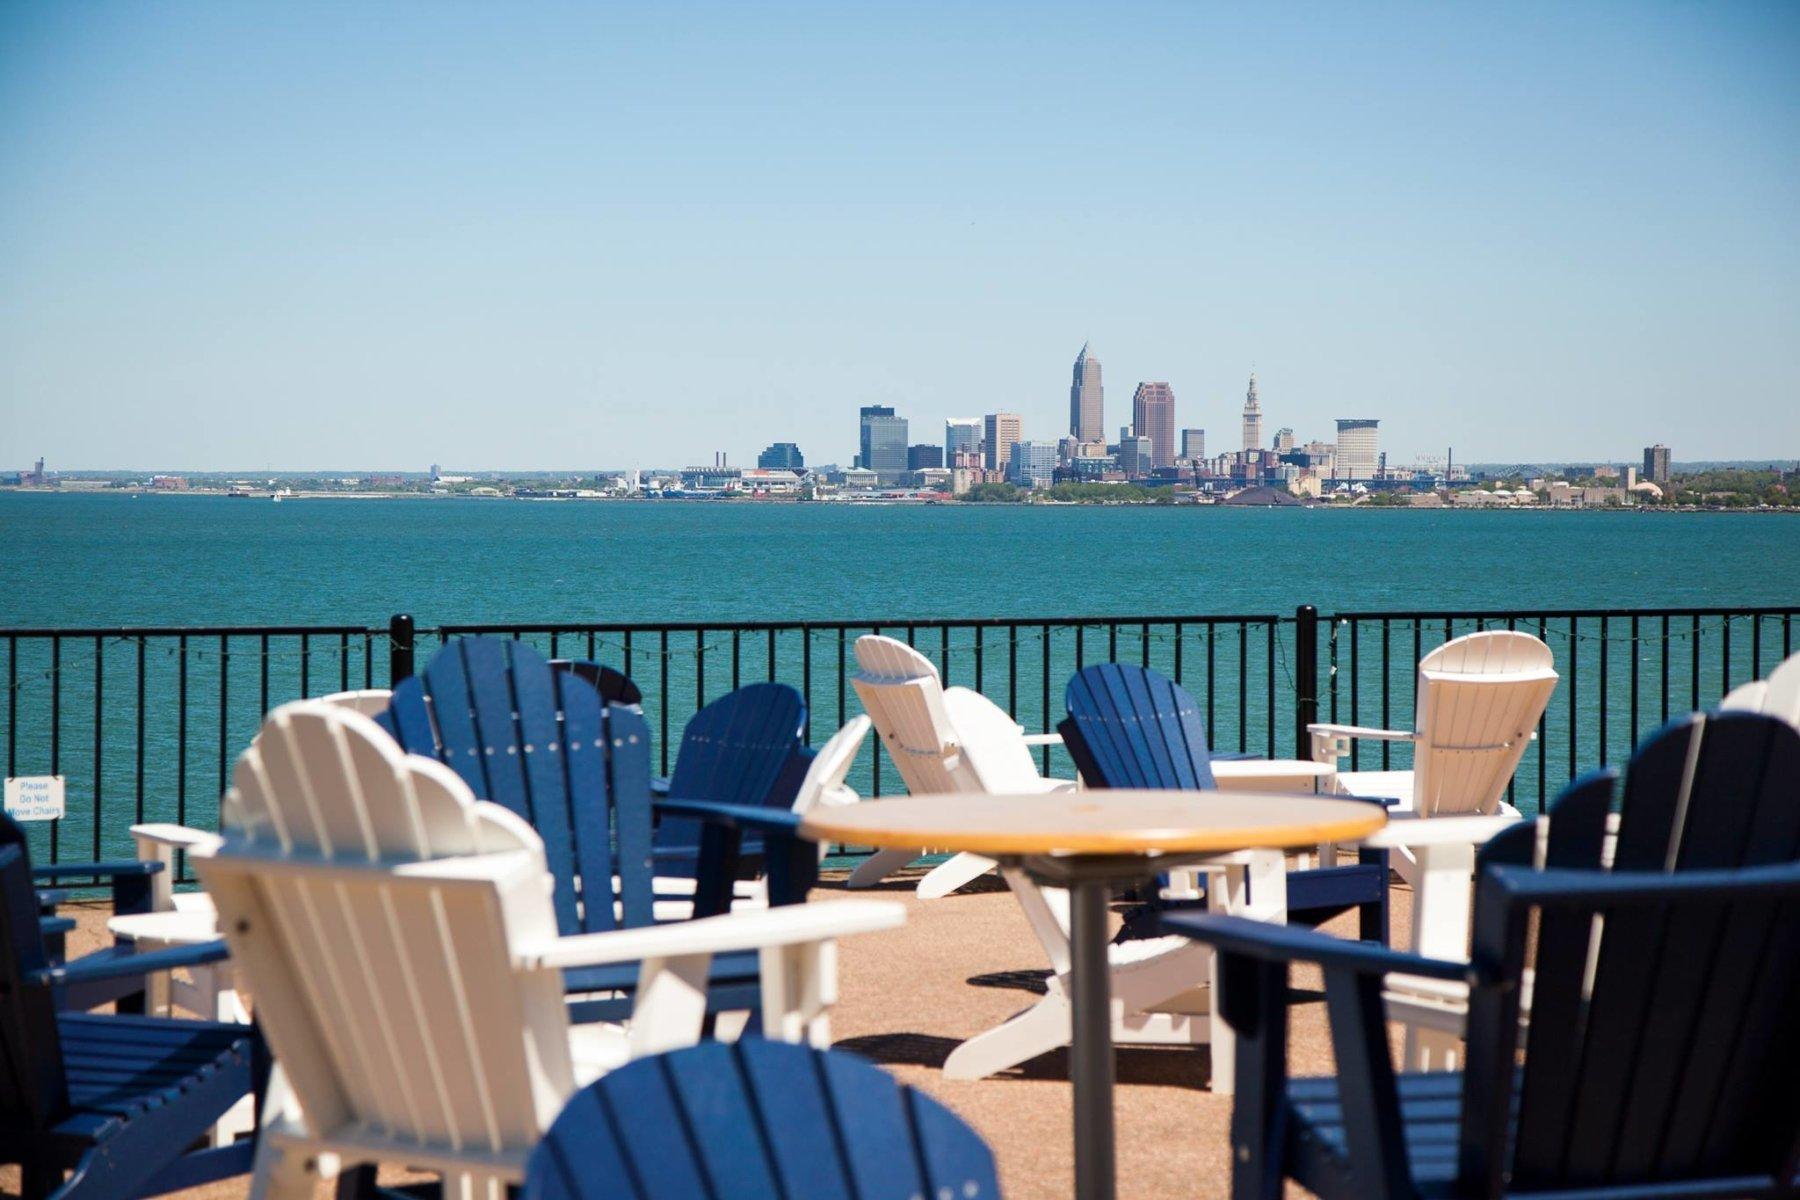 The Best Waterfront Restaurants In Ohio